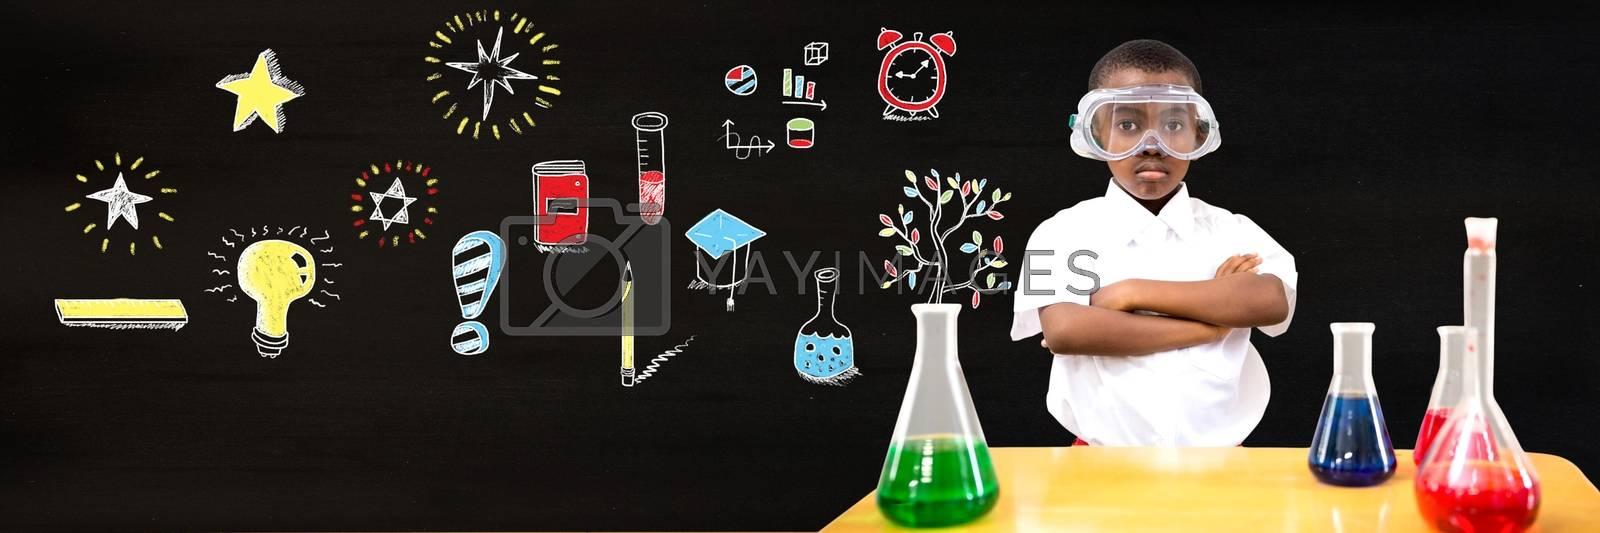 Digital composite of School boy scientist and Education drawing on blackboard for school